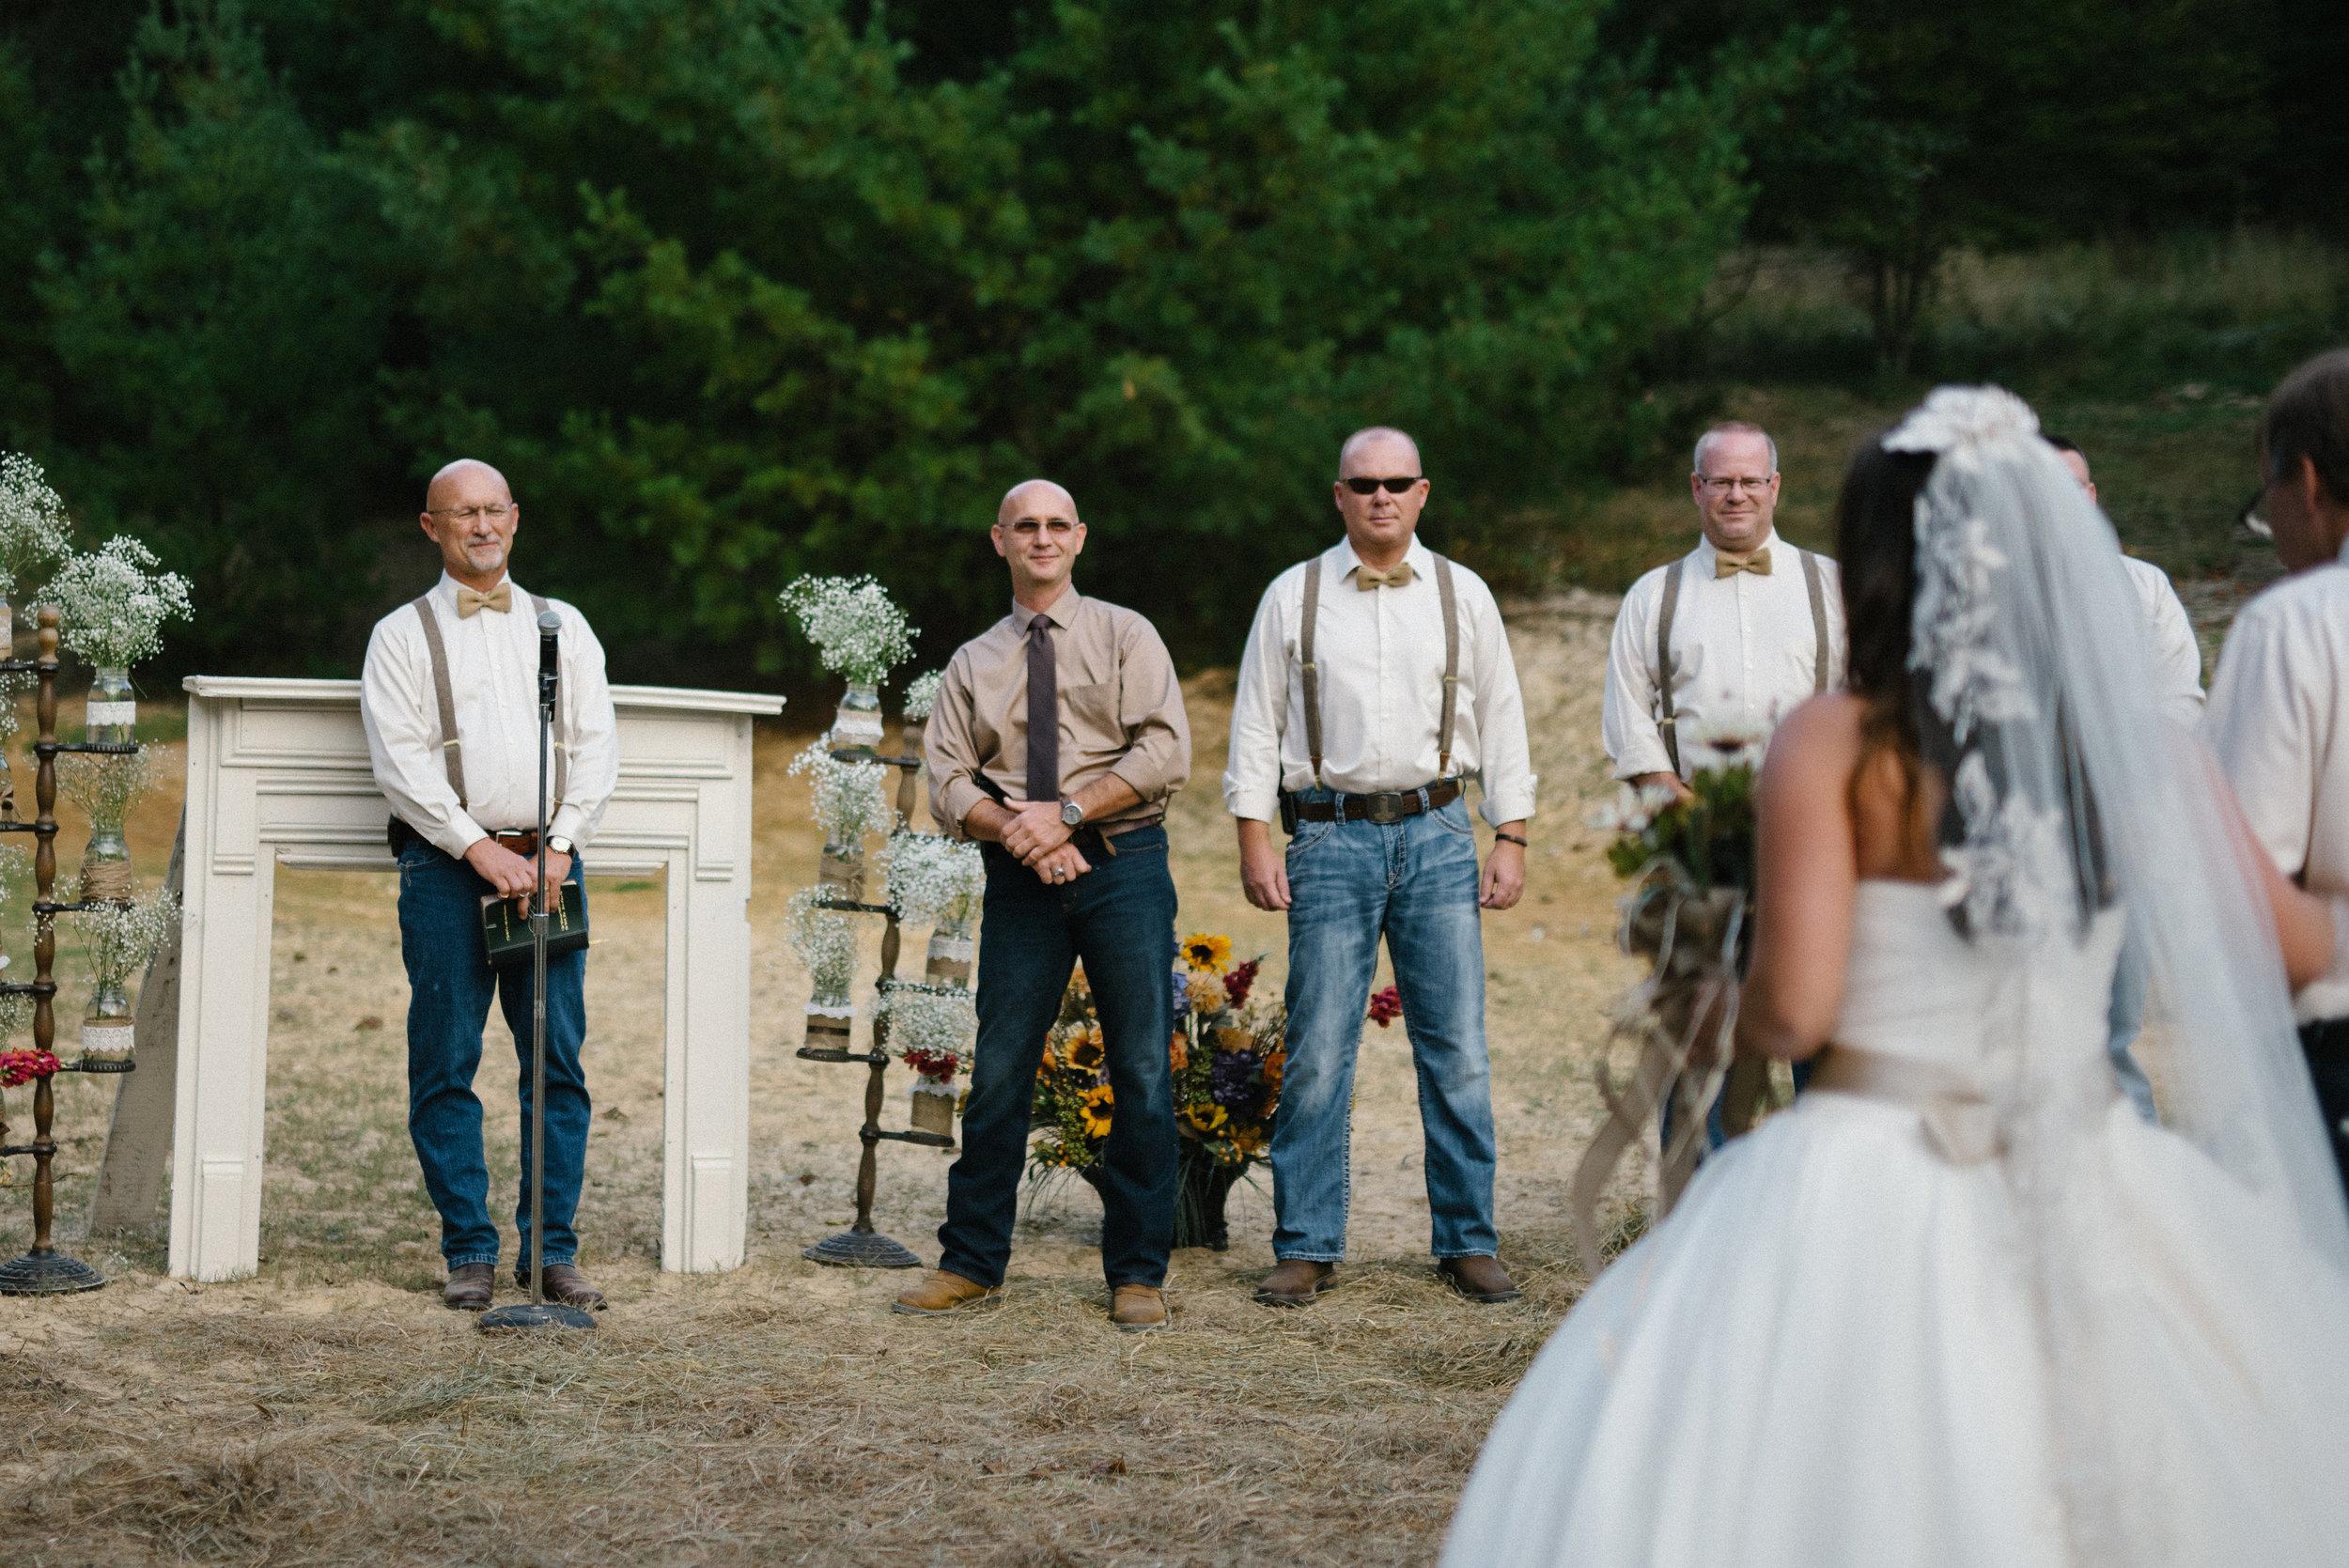 groom-face-when-bride-is-walking-down-the-aisle.jpg